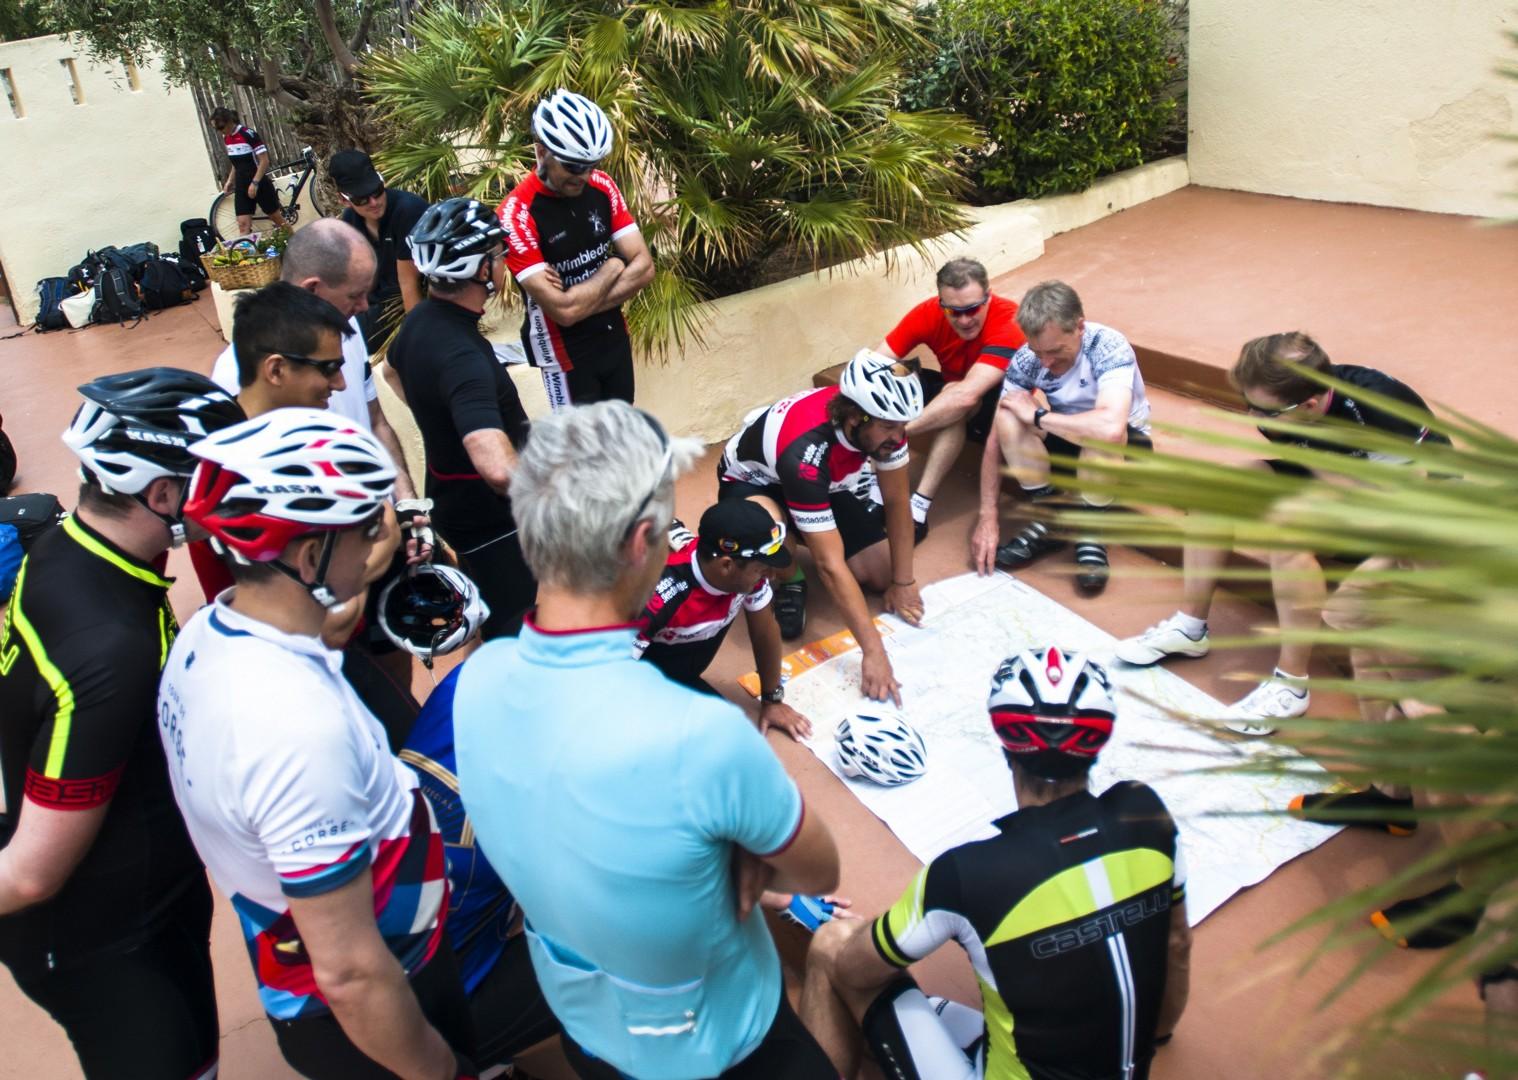 ronda6.jpg - Southern Spain - Roads of Ronda - Road Cycling